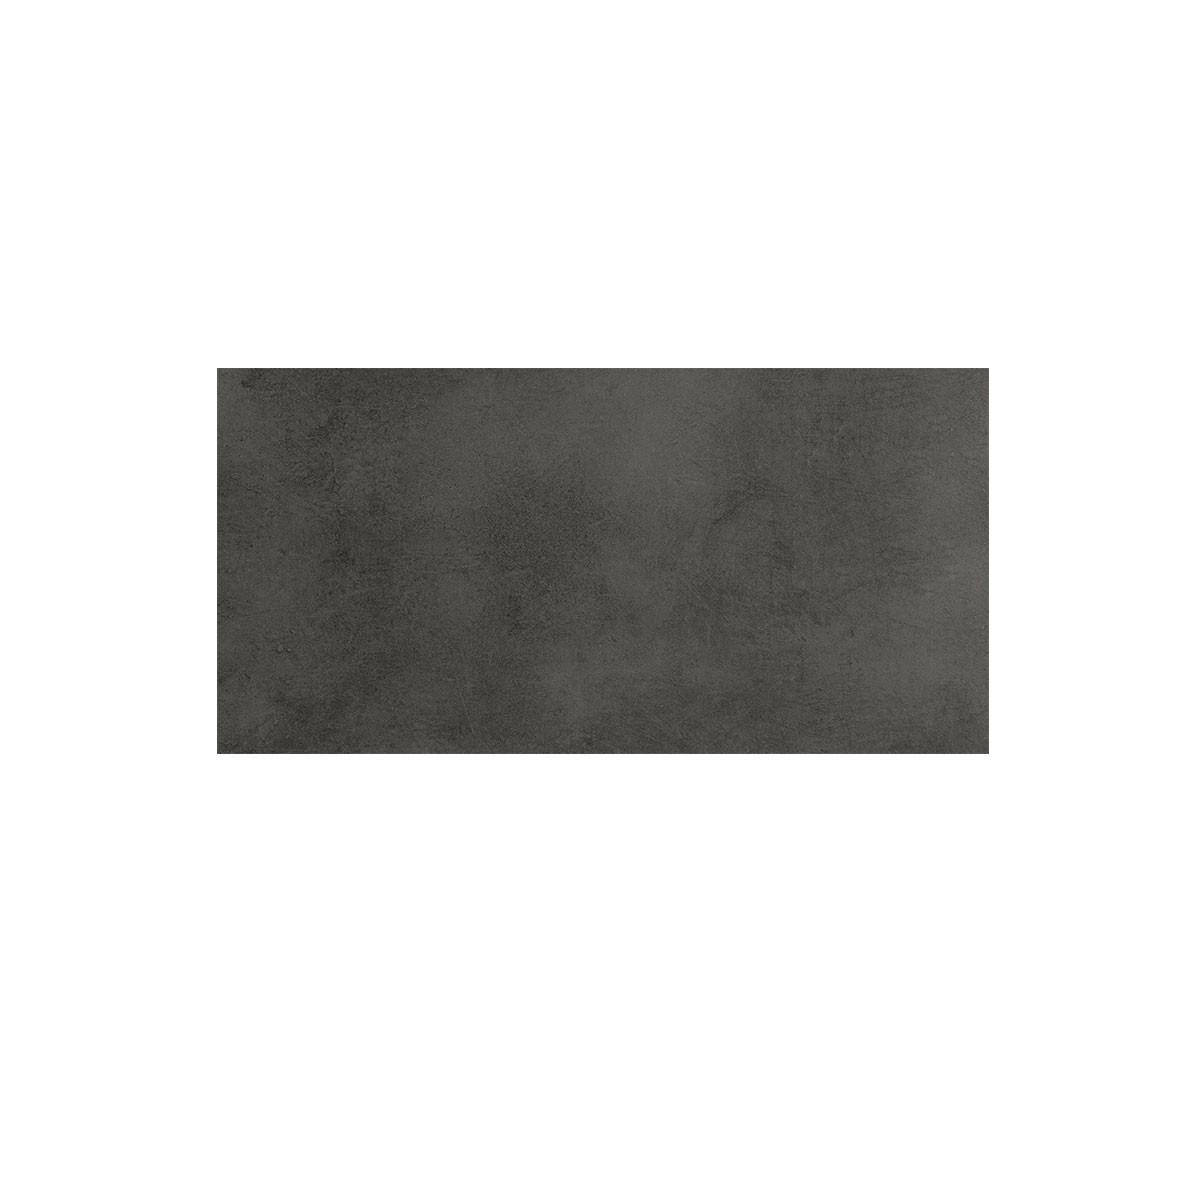 DECORAPORT NWS Wall Panel, Luxor Dark, 4'' x6'' (NLS-09) (Sample)